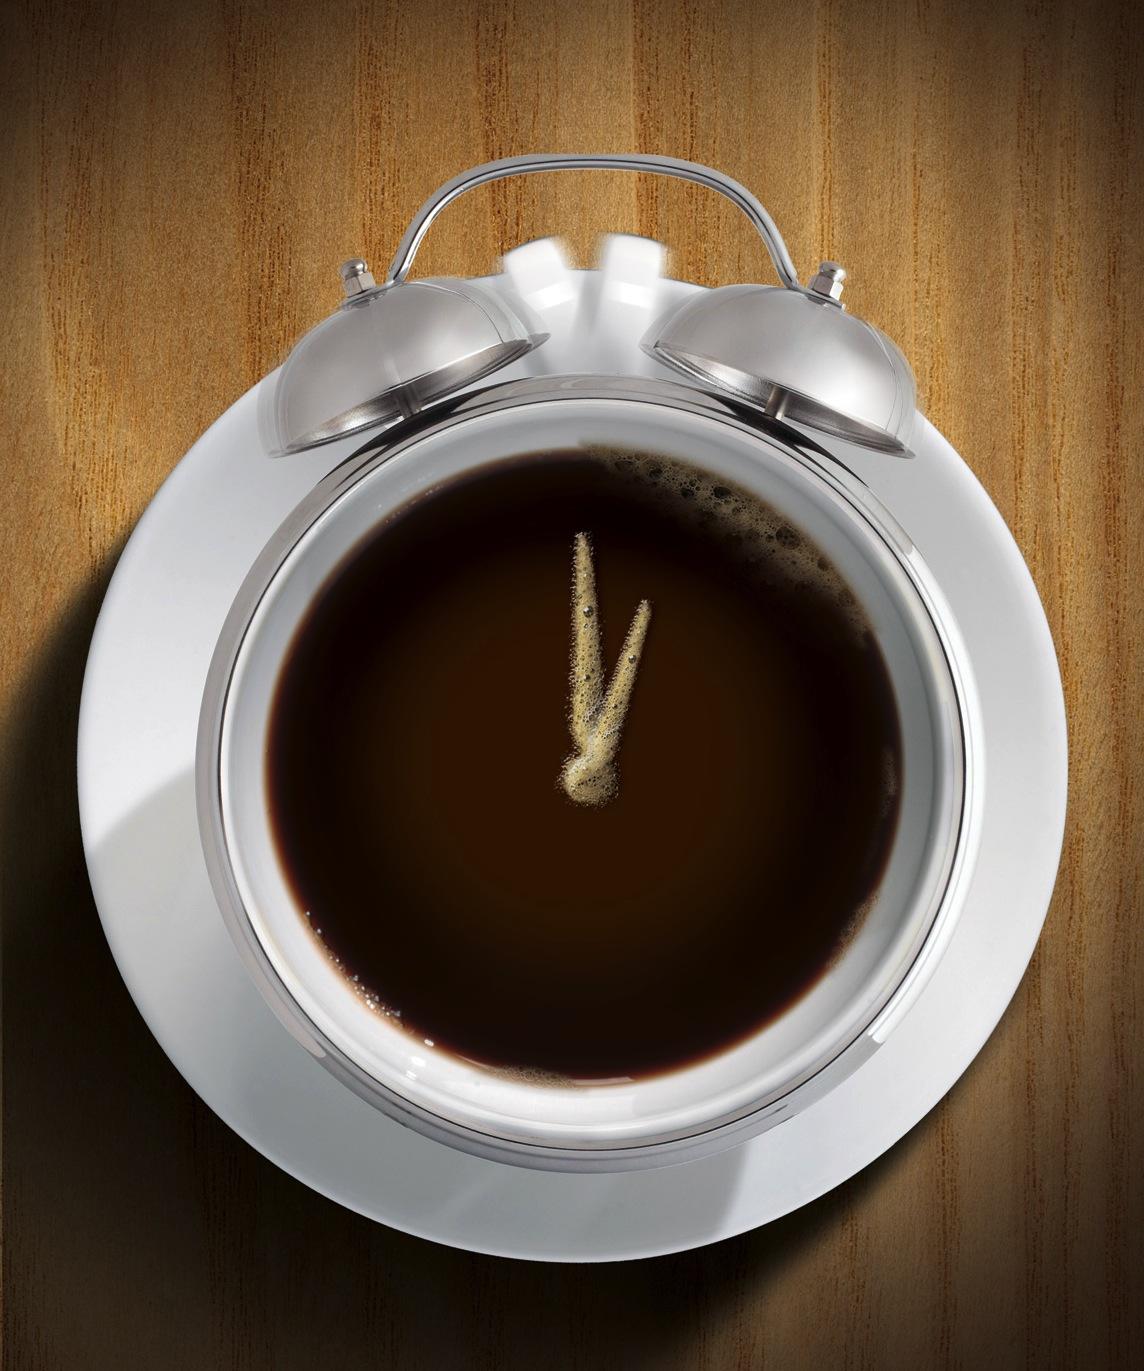 Hora do coffee break